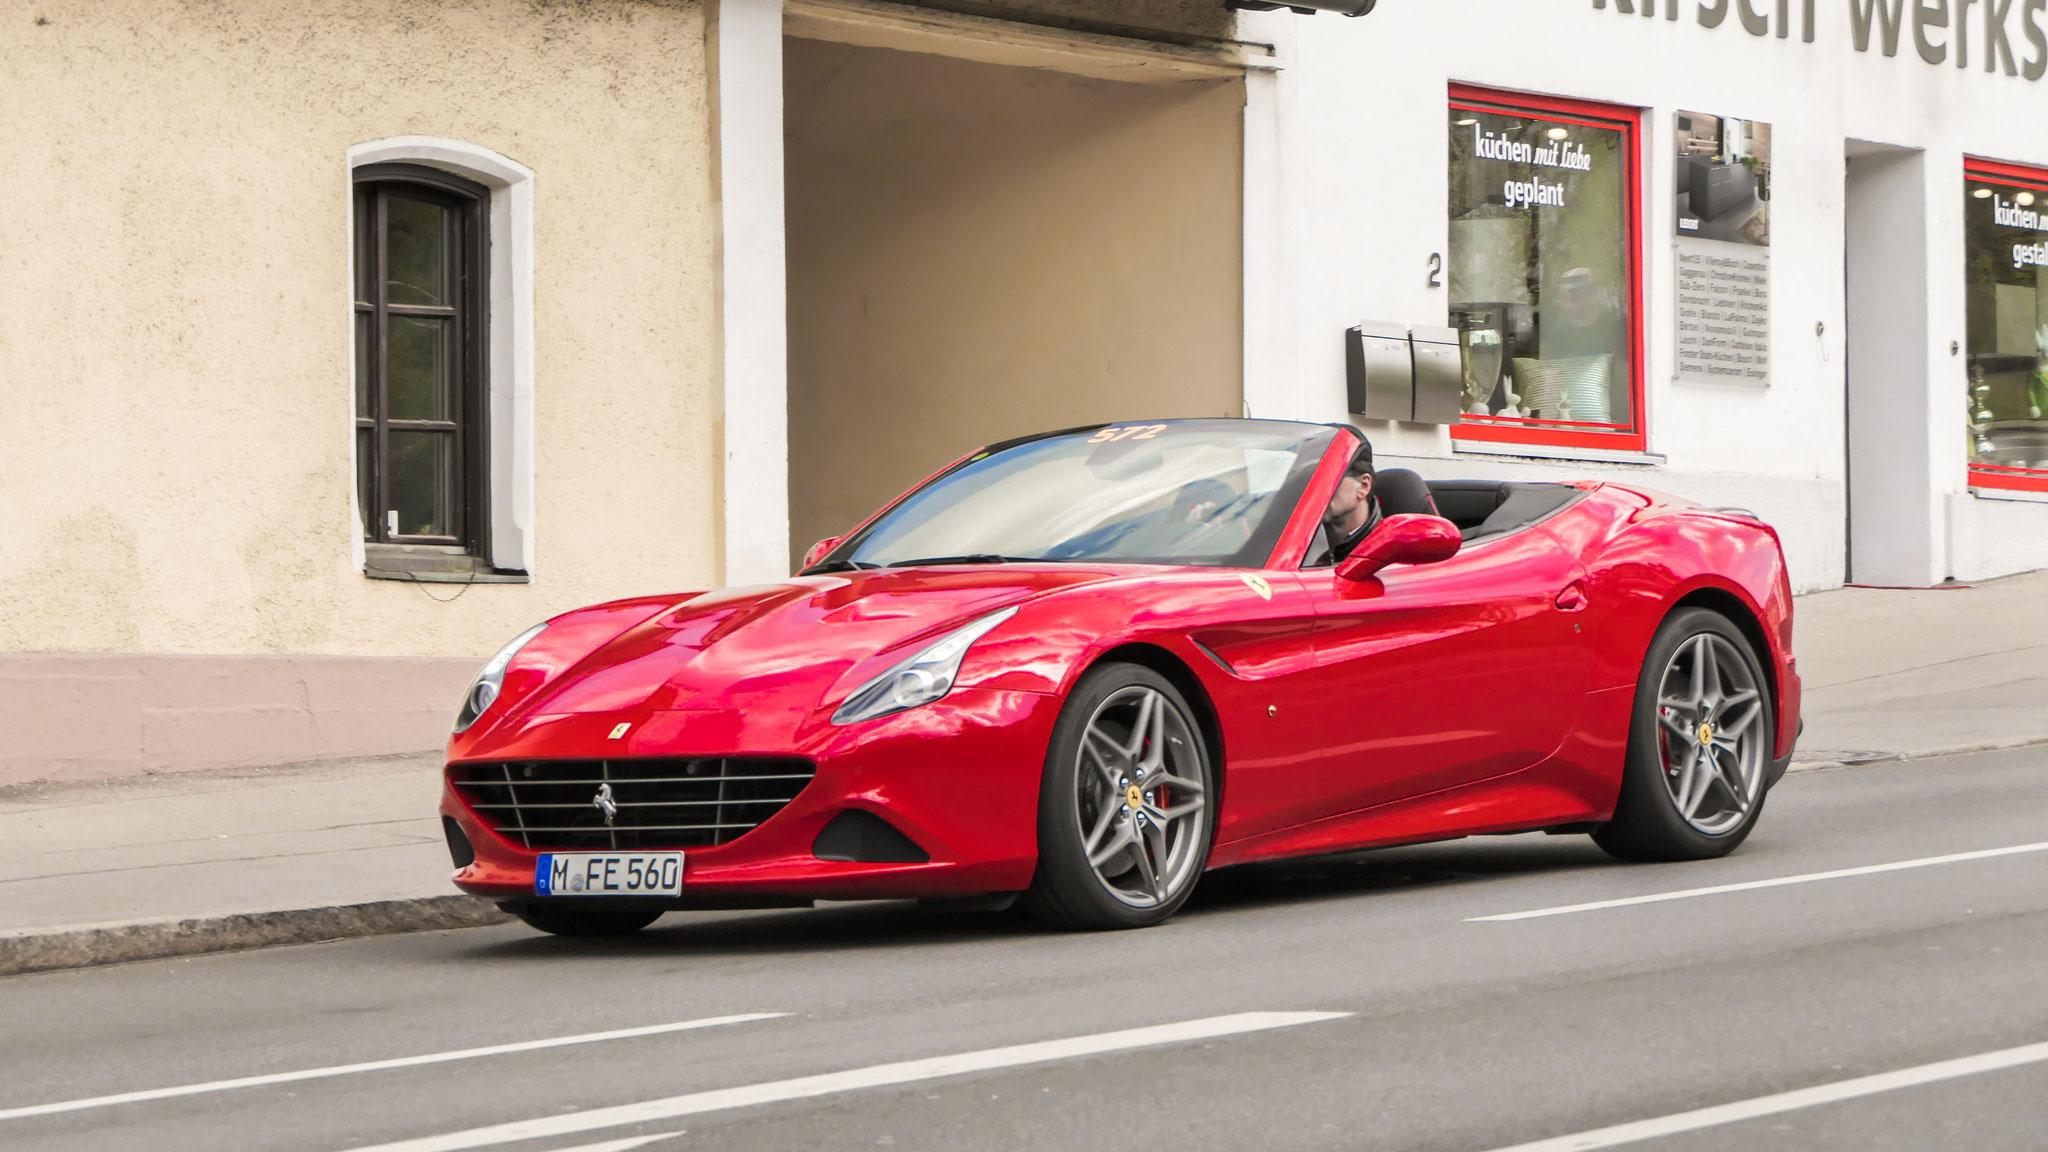 Ferrari California T - M-FE-560